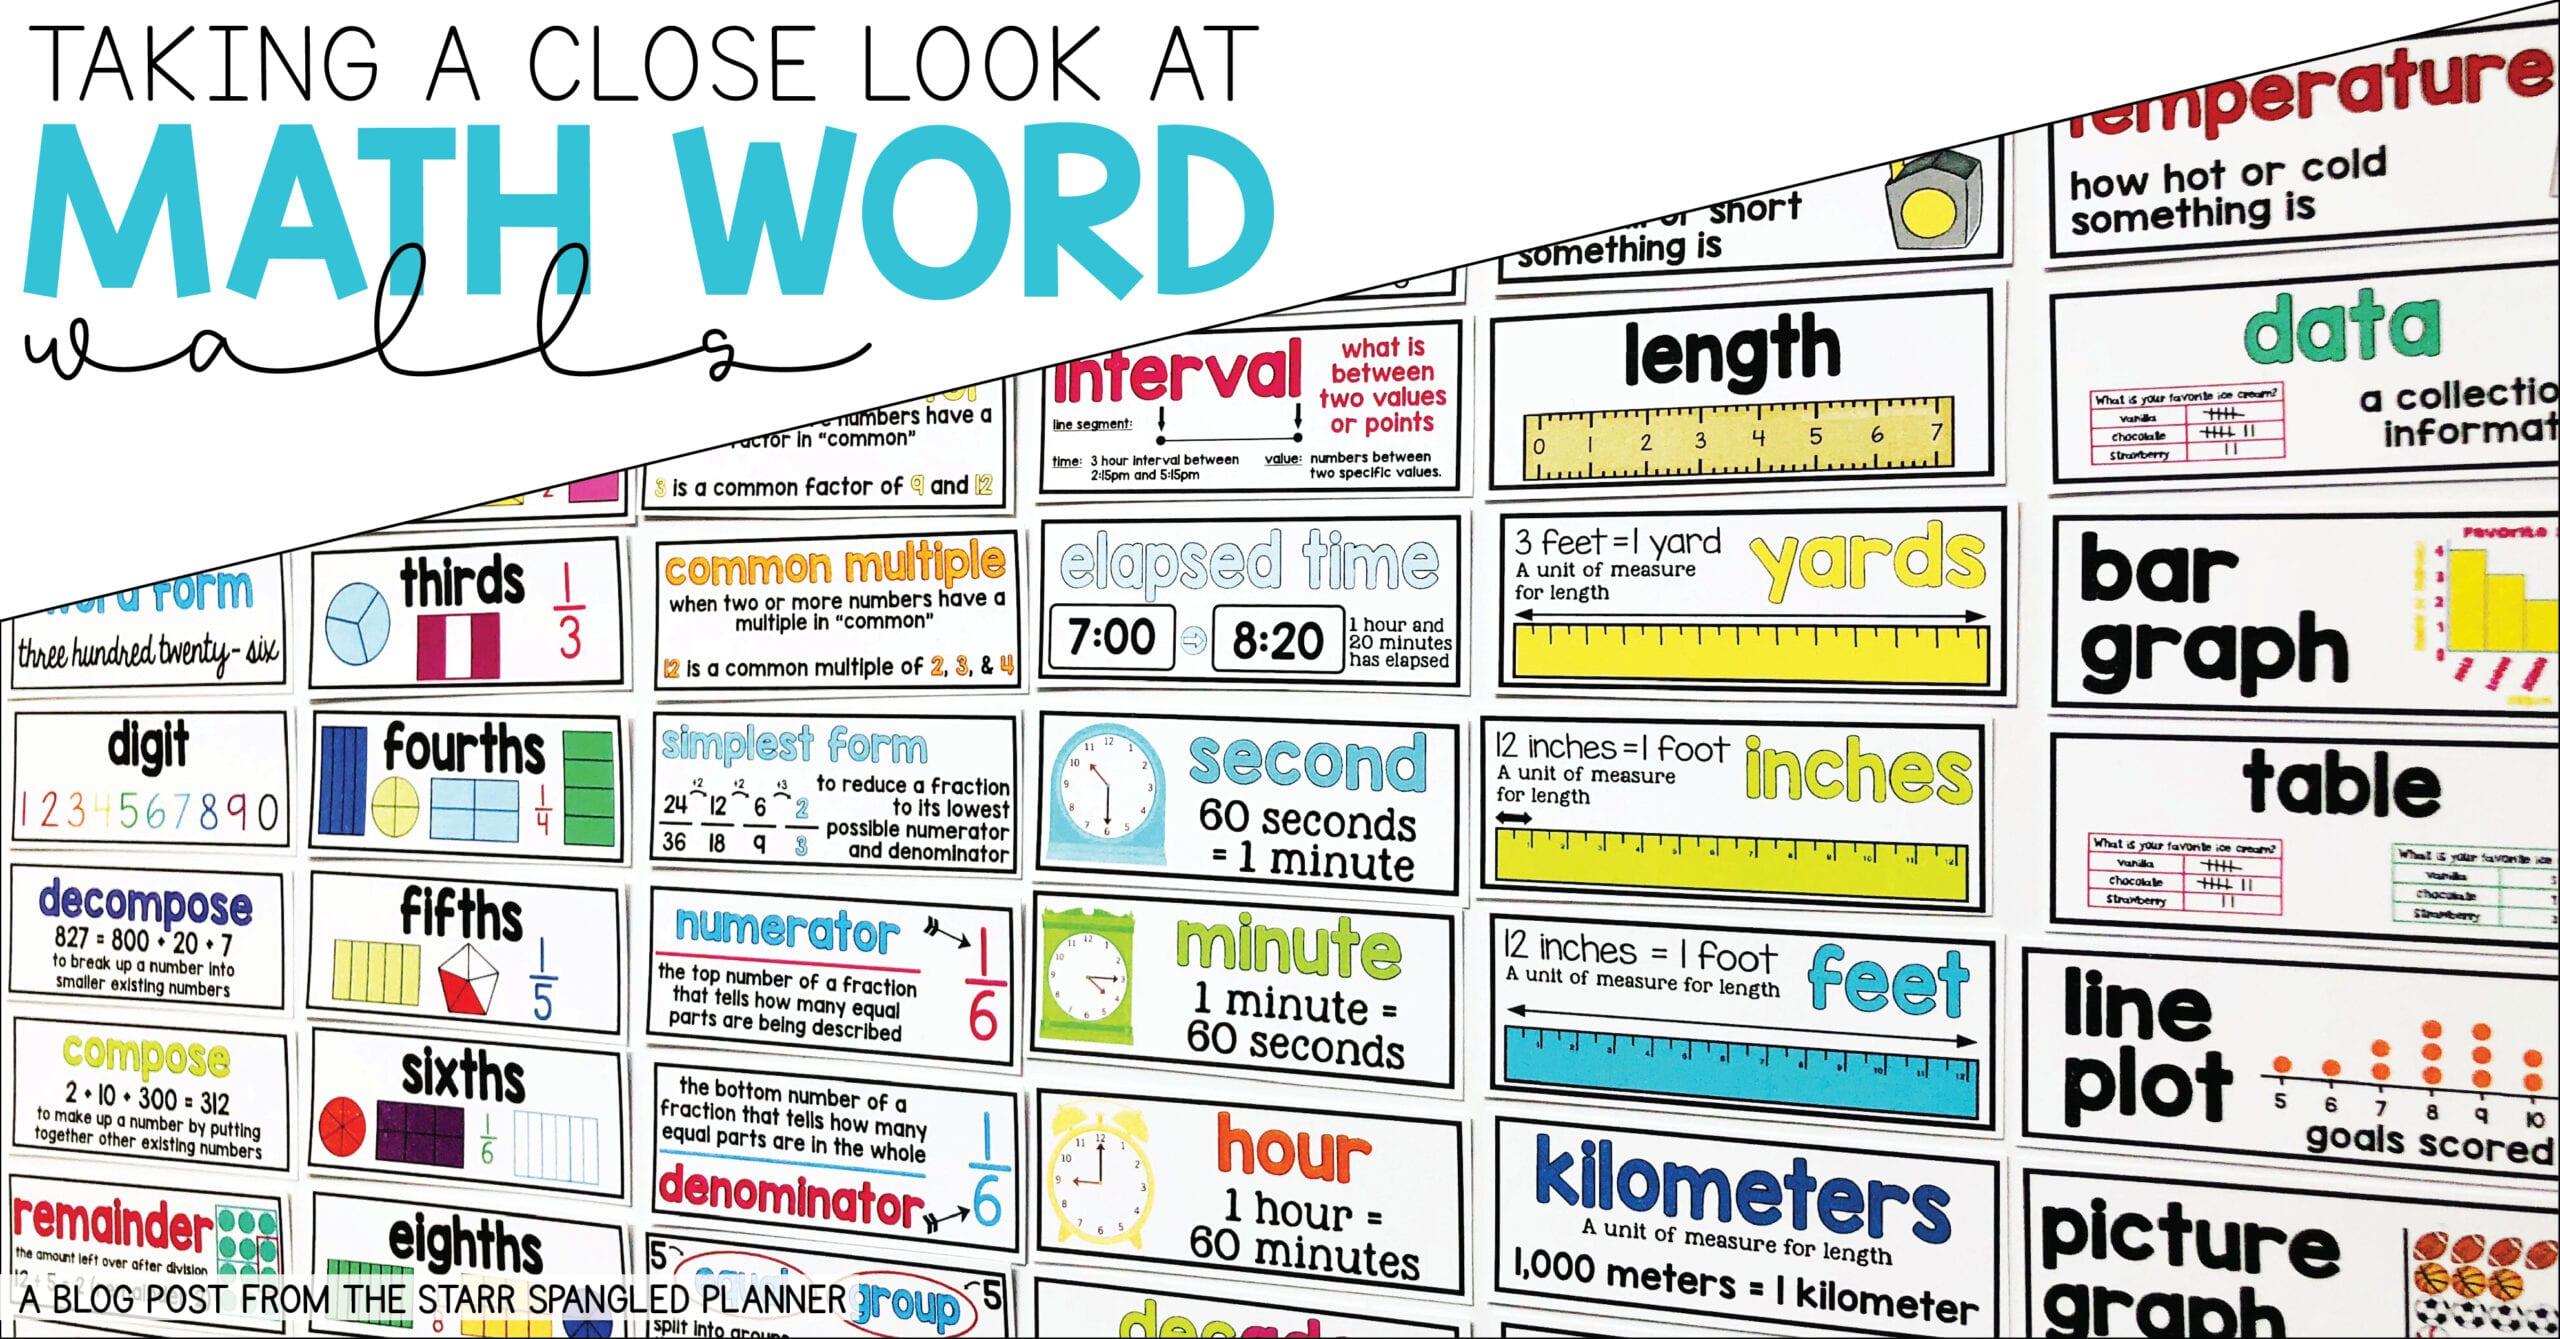 Math Word Walls: How to Teach Math Vocabulary - Teaching ...